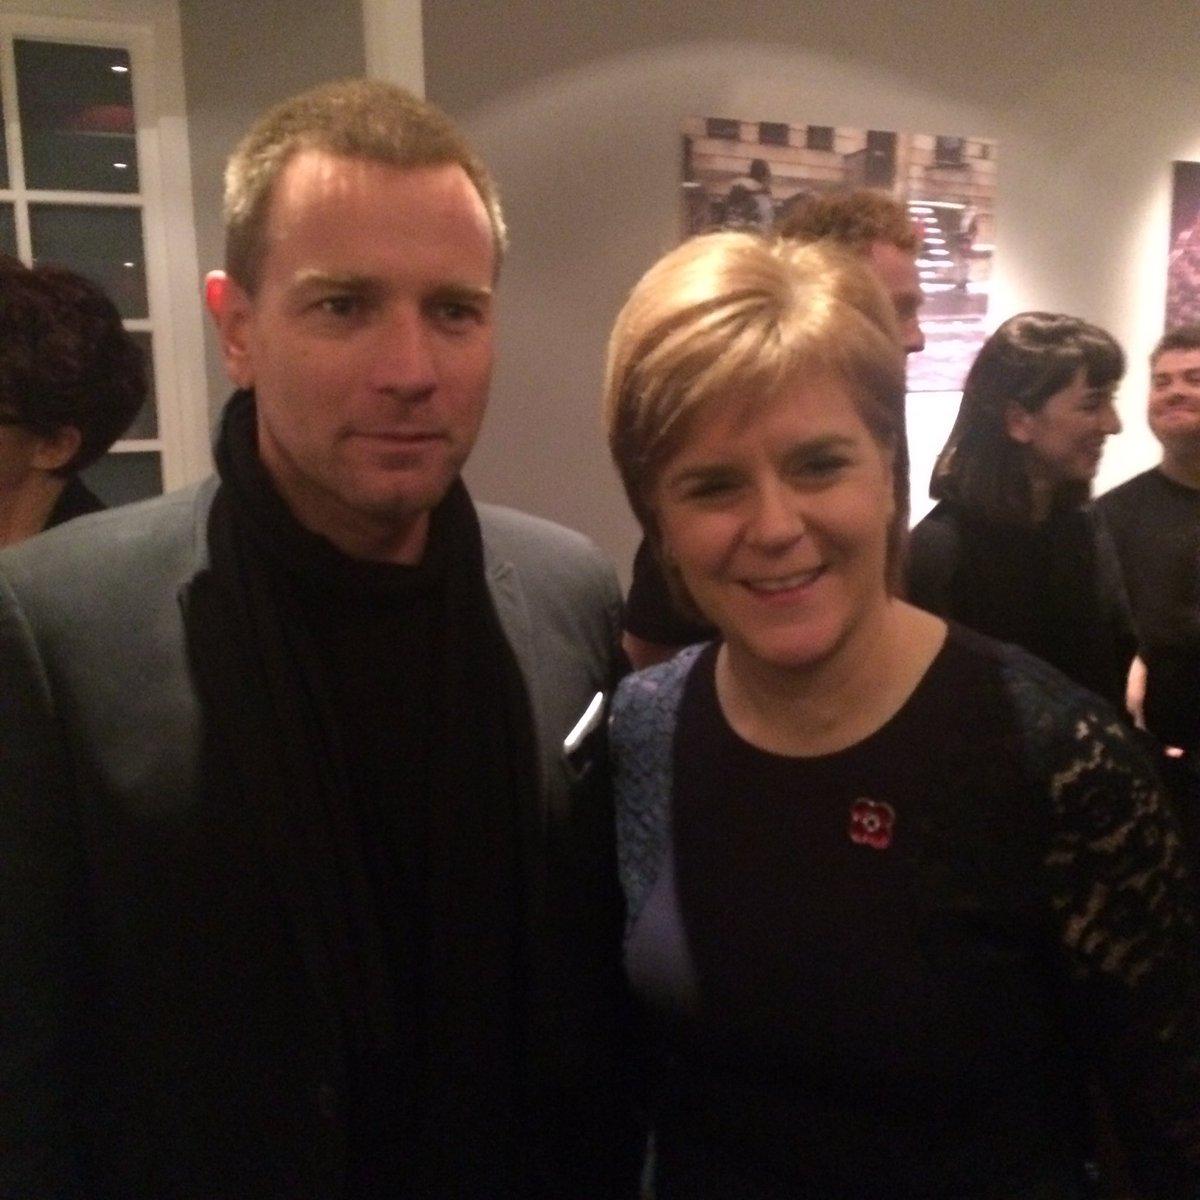 Nicola and Ewan in the Café Bar!!! #AmericanPastoral #edfilmfest #EwanMcGregor #FirstMinister https://t.co/6CFDqDkiQi